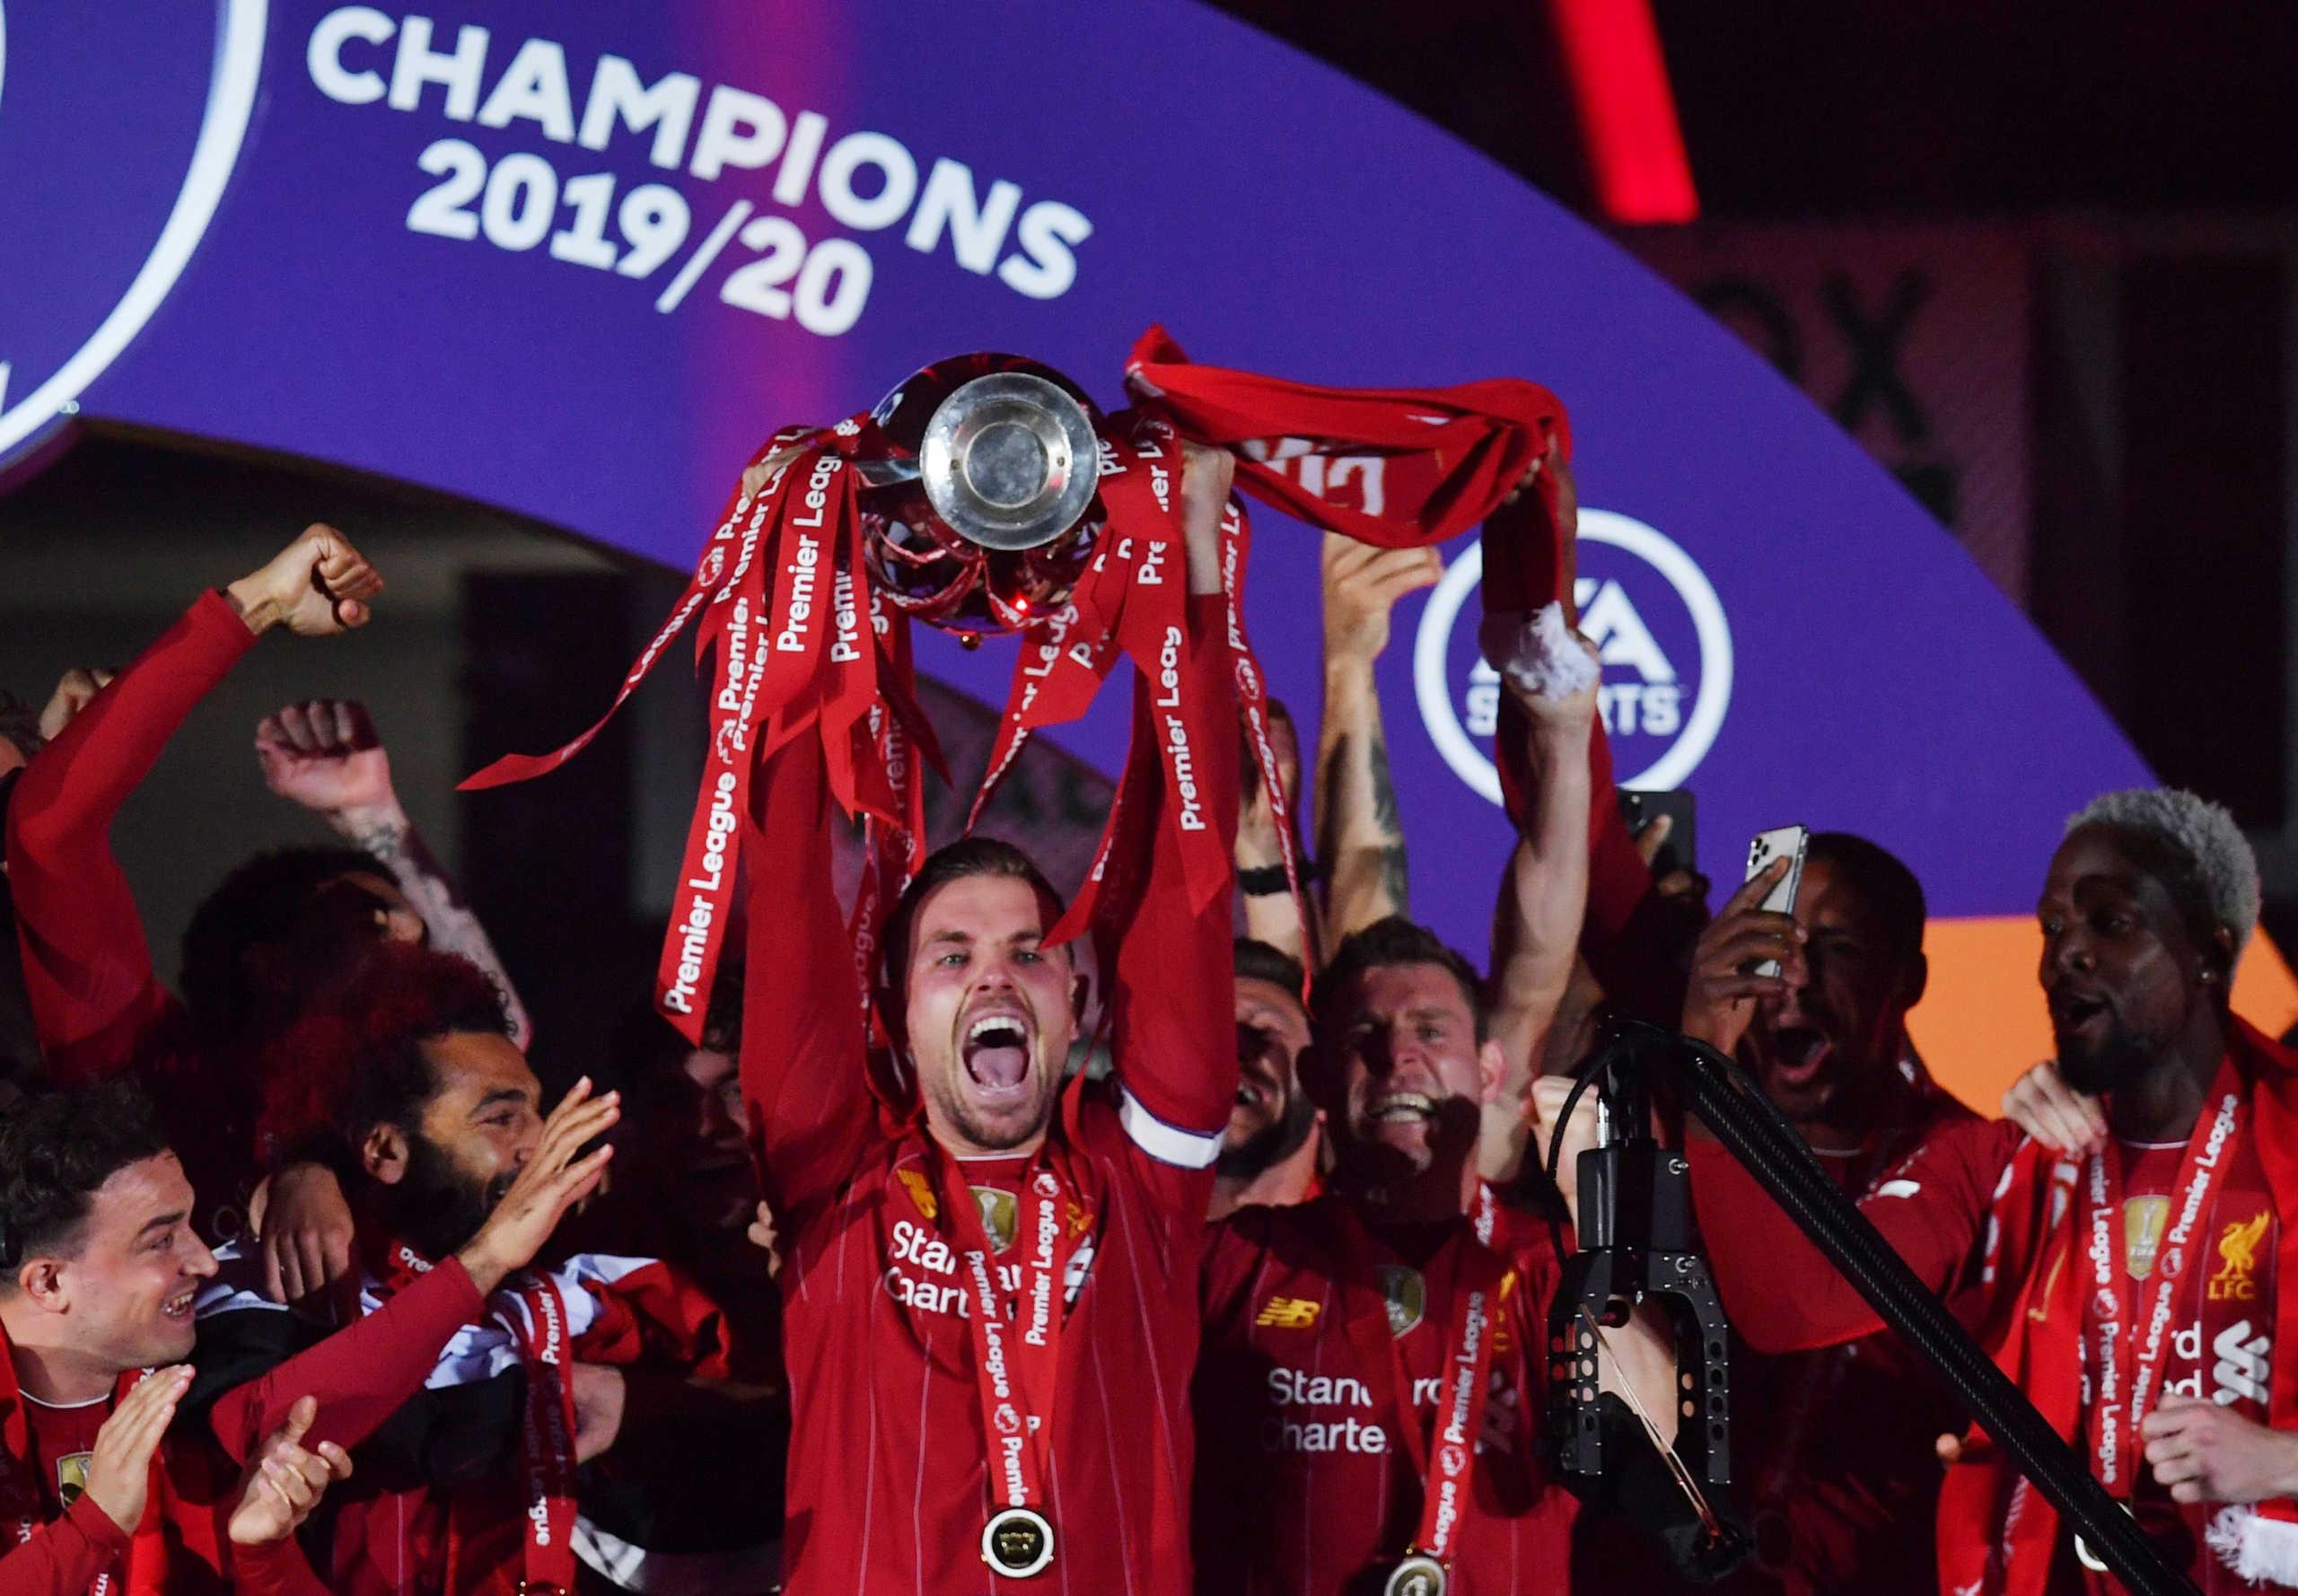 Premier League: Αυτή είναι η ενδεκάδα της σεζόν! Πέντε παίκτες της Λίβερπουλ χωρίς Σαλάχ (video)